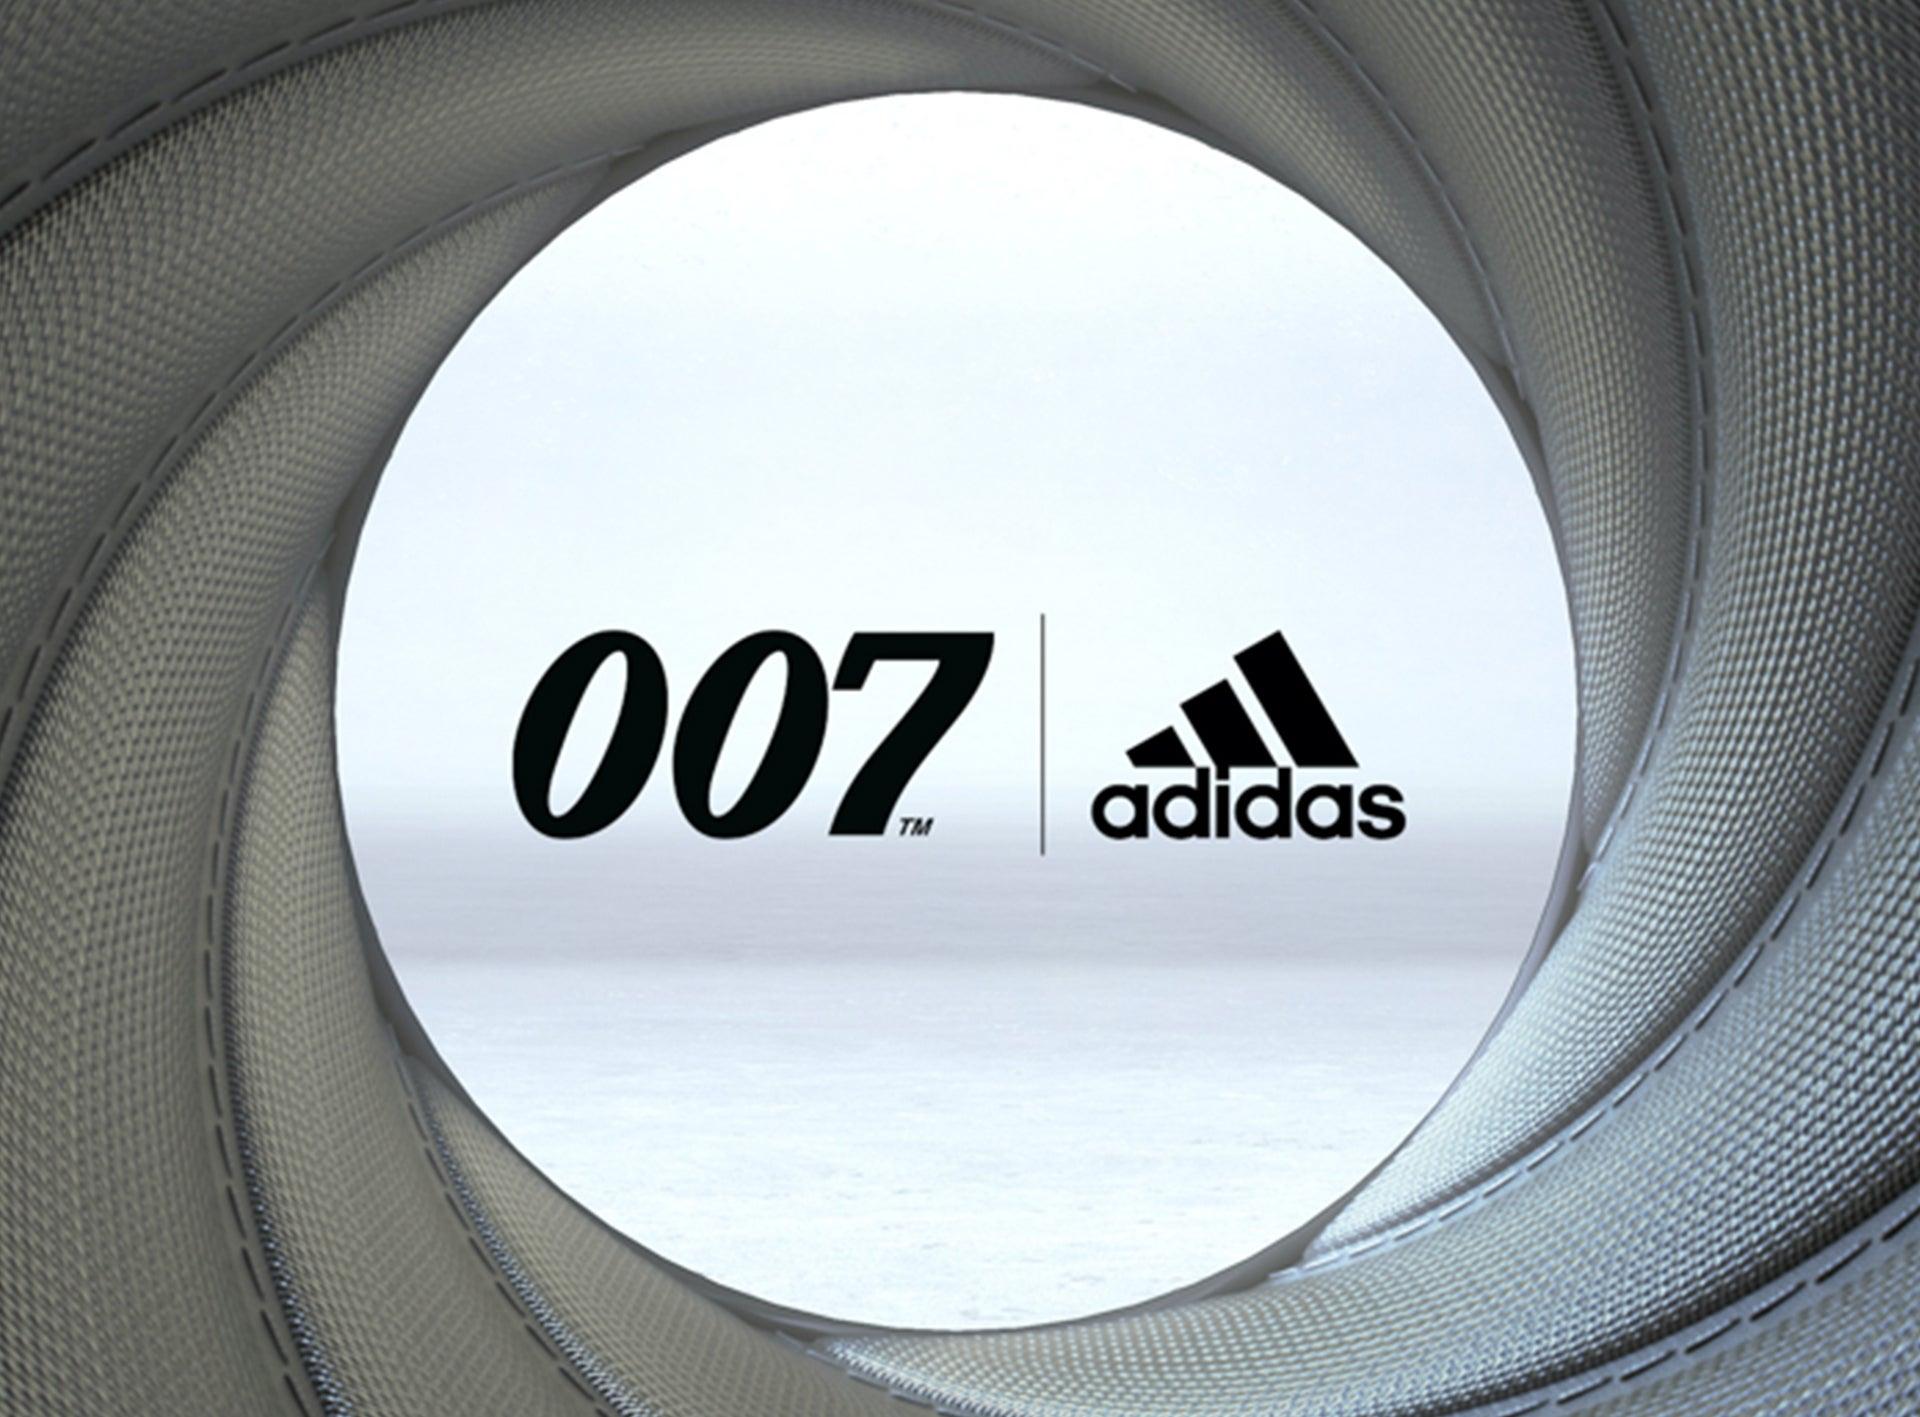 adidas x James Bond Collection Unveiled